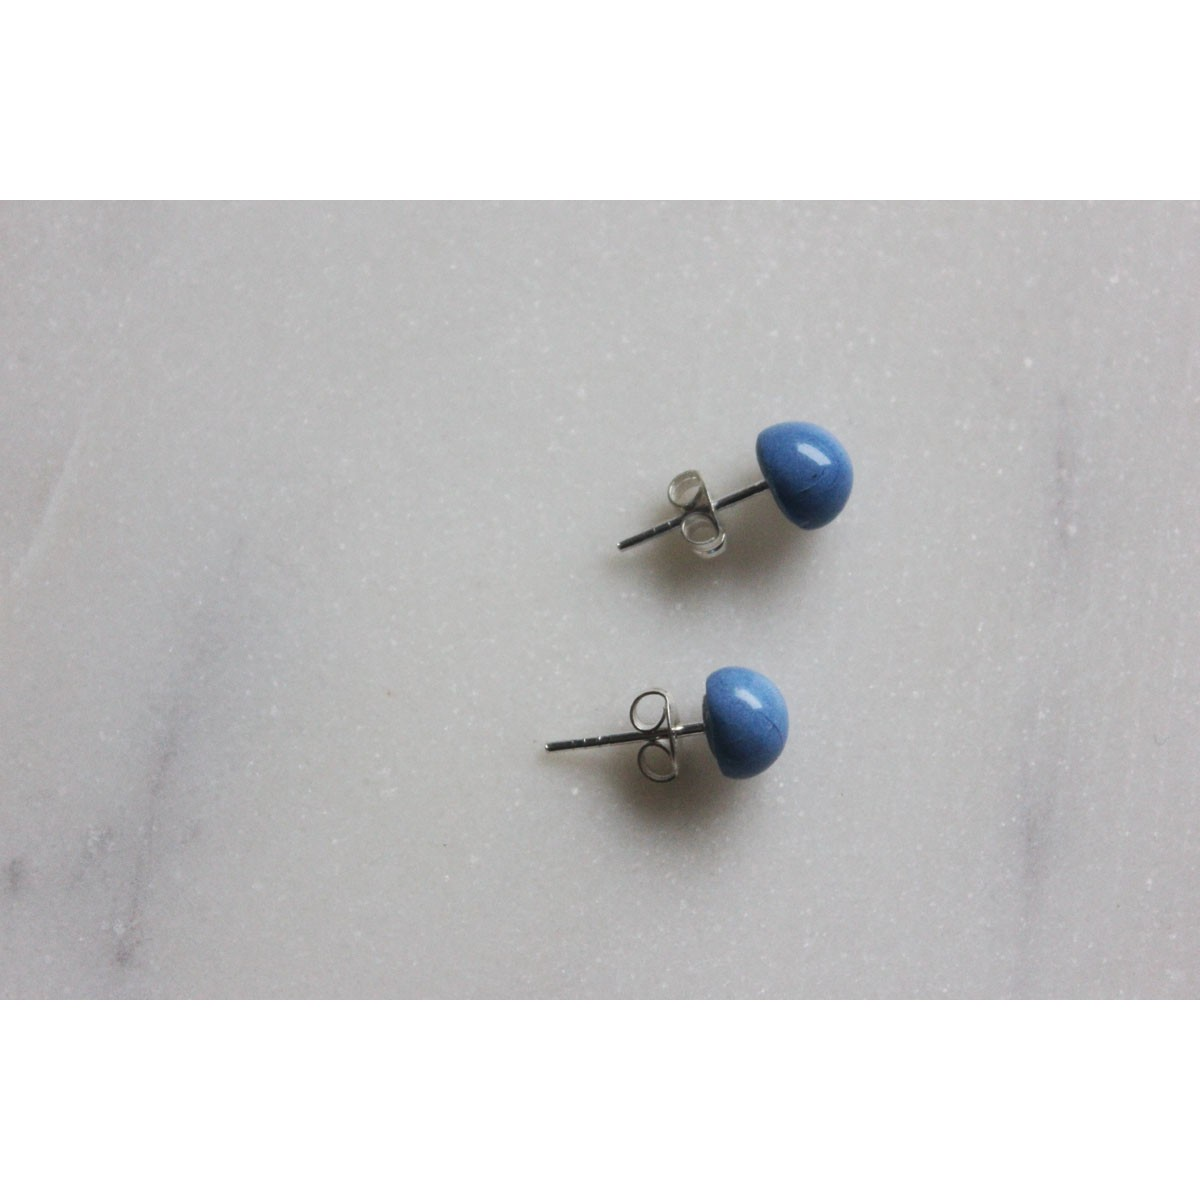 Skelini - Blaue Porzellan runde Ohrstecker, kobaltblau